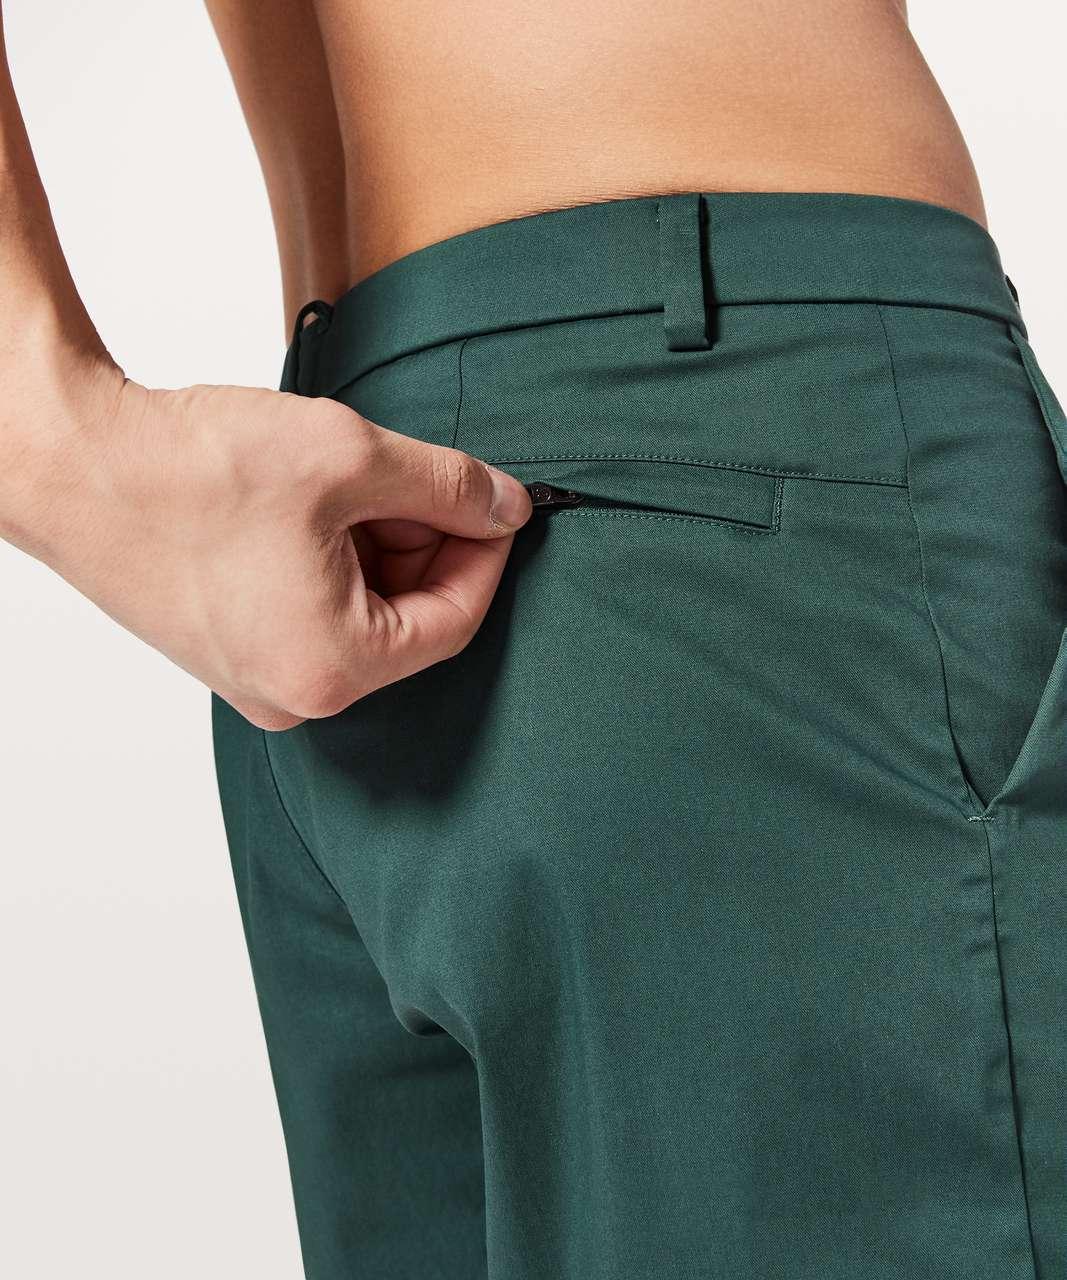 "Lululemon Commission Short Slim *Chino 9"" - Antigua"